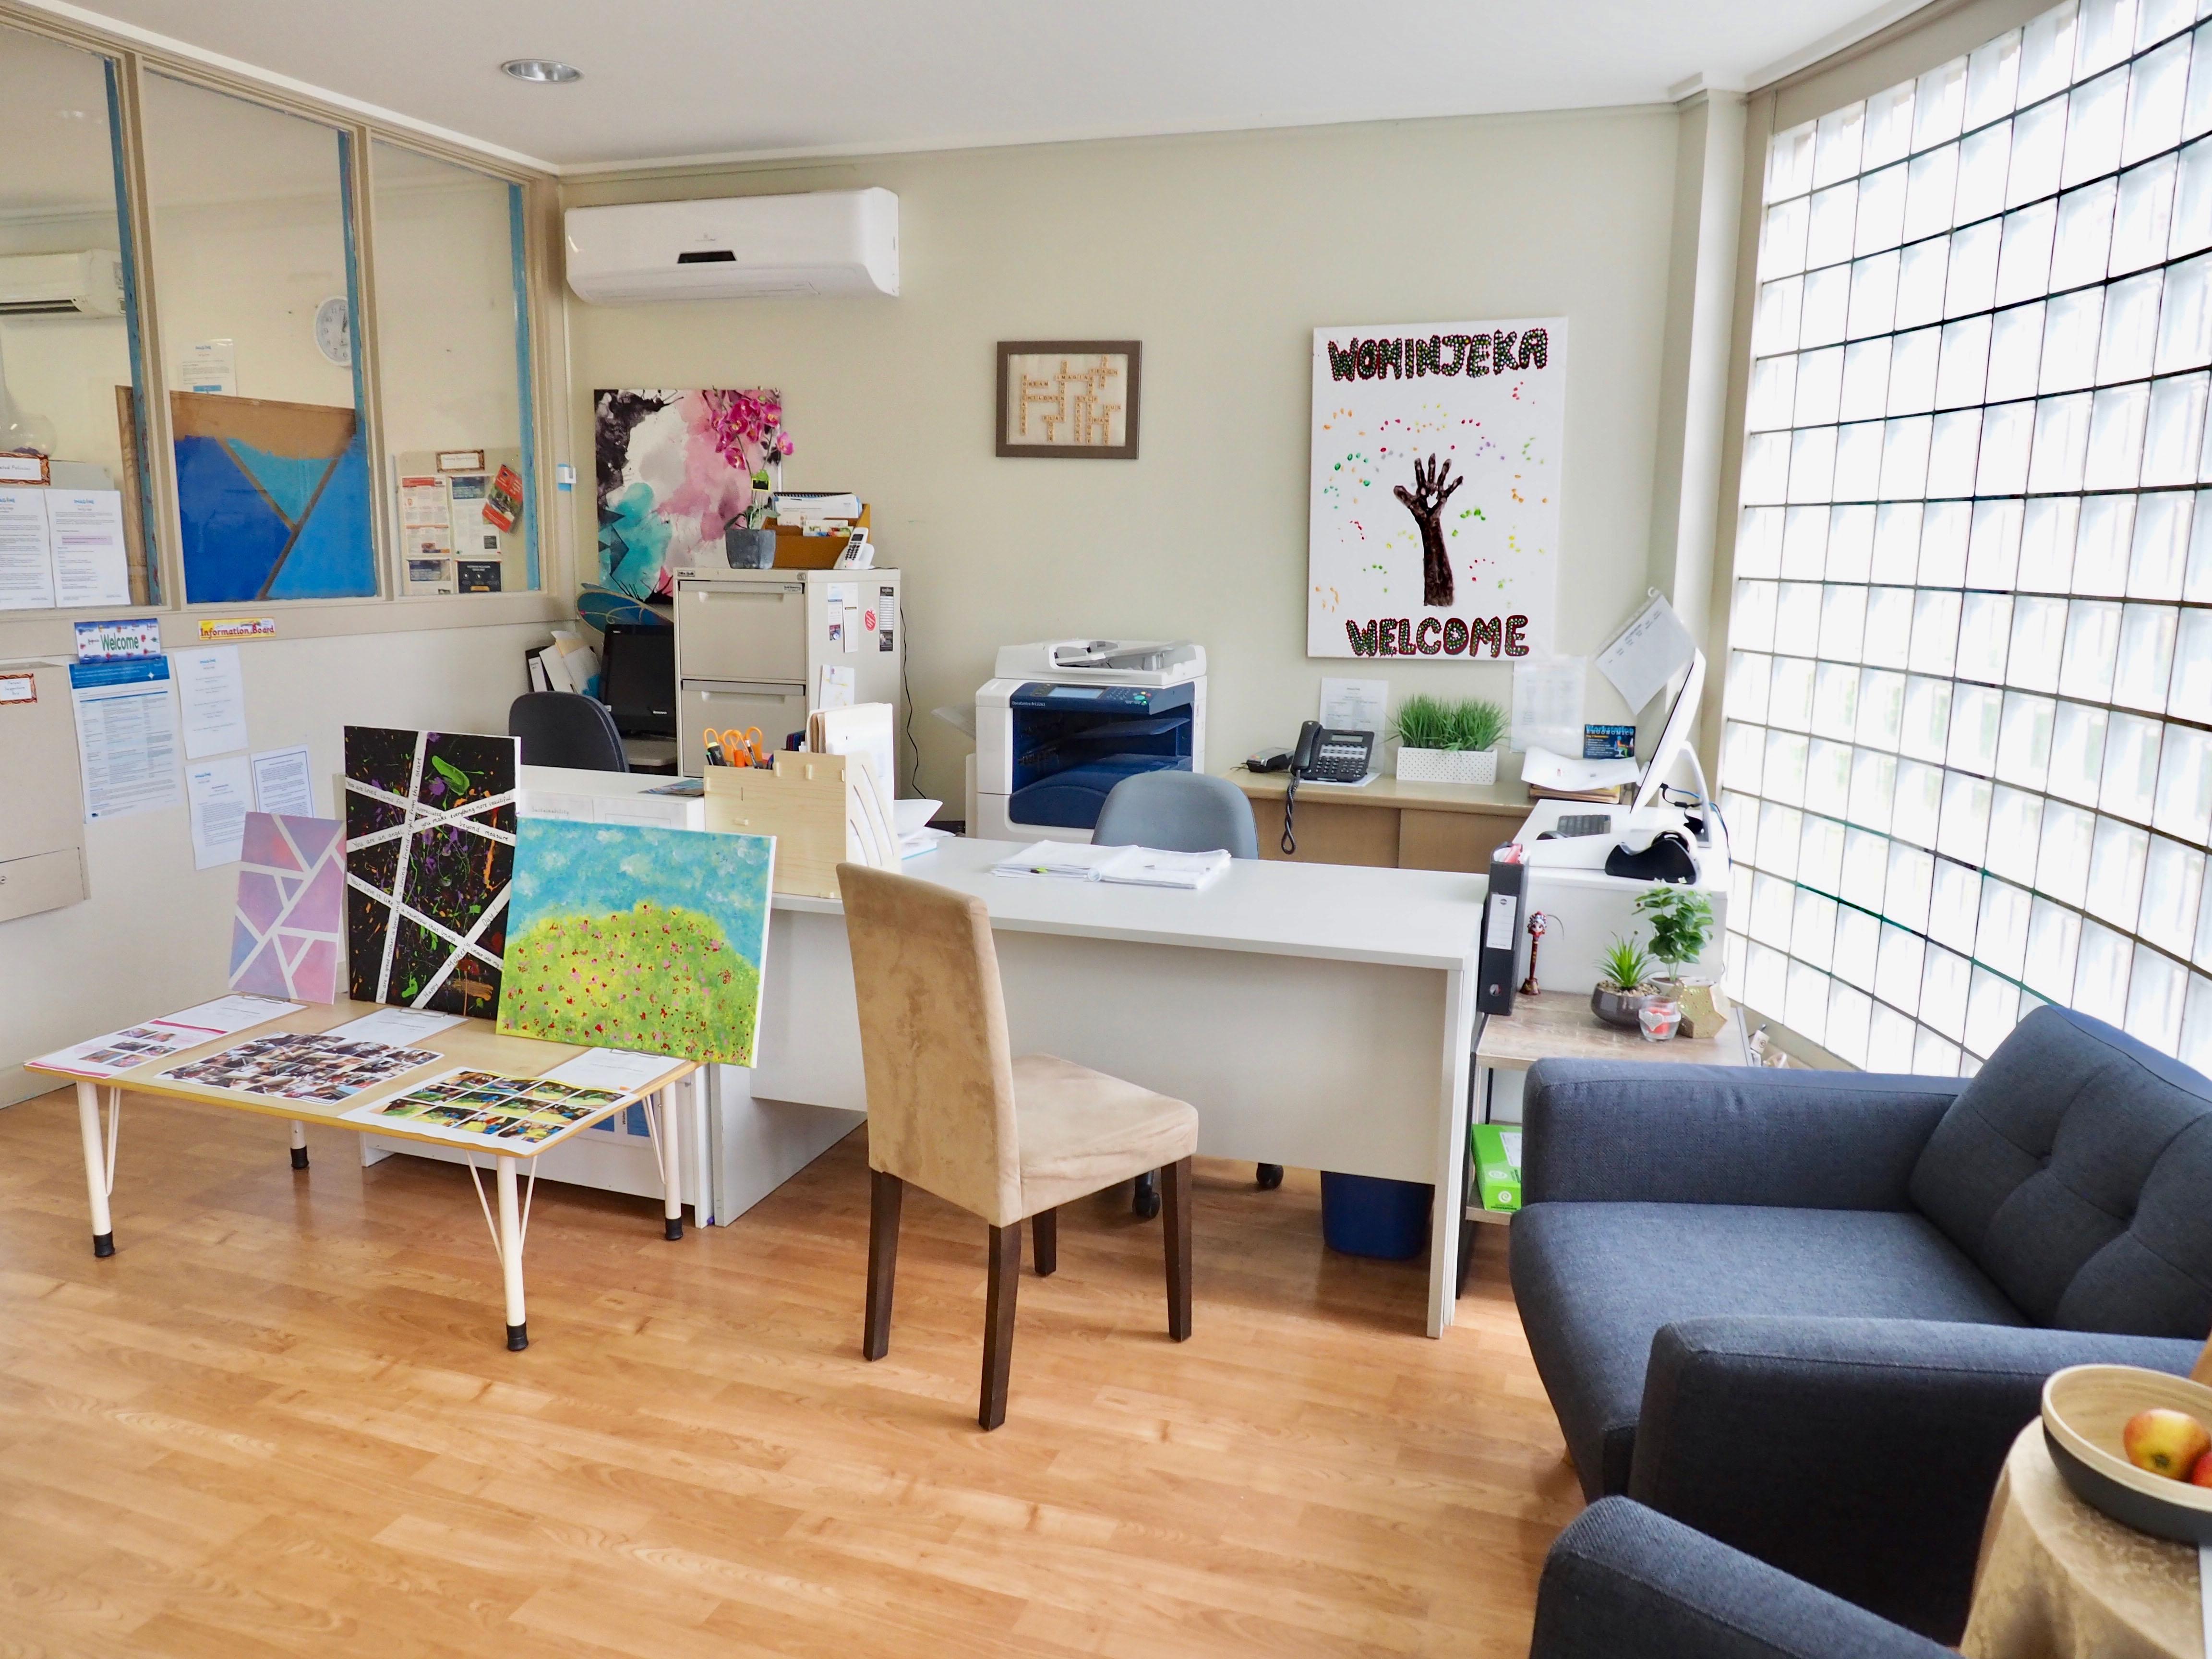 Imagine Childcare And Kindergarten Templestowe | 1 Niland Rise, TEMPLESTOWE, Victoria 3106 | +61 3 9846 3425